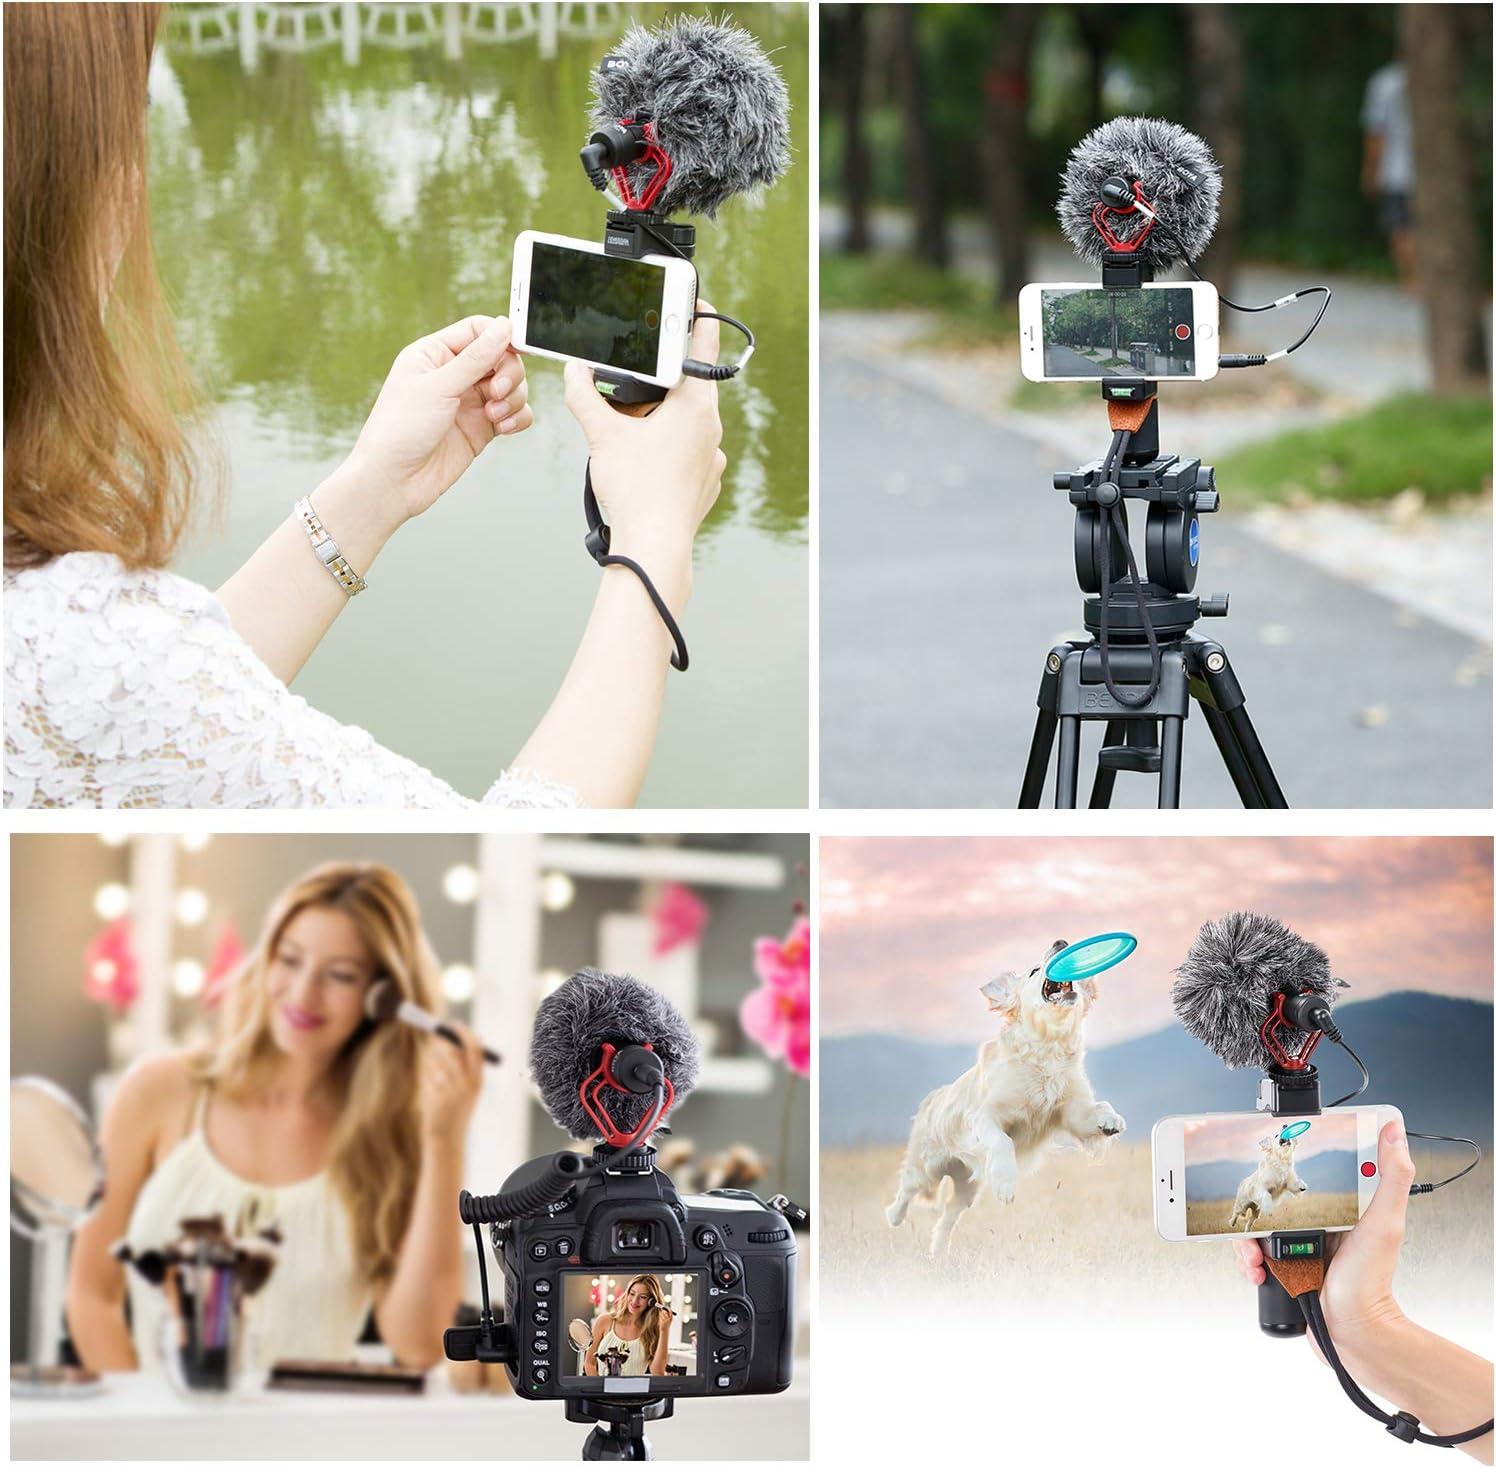 Sevenoak 3.5mm Cardiod Mini Mic for iPhone X 8 8 Plus 7 6 6s iOS Andrioid LG Mac Tablet Canon DSLR Camera Camcorder YouTube Video Shotgun Microphone Smartphone Vlog